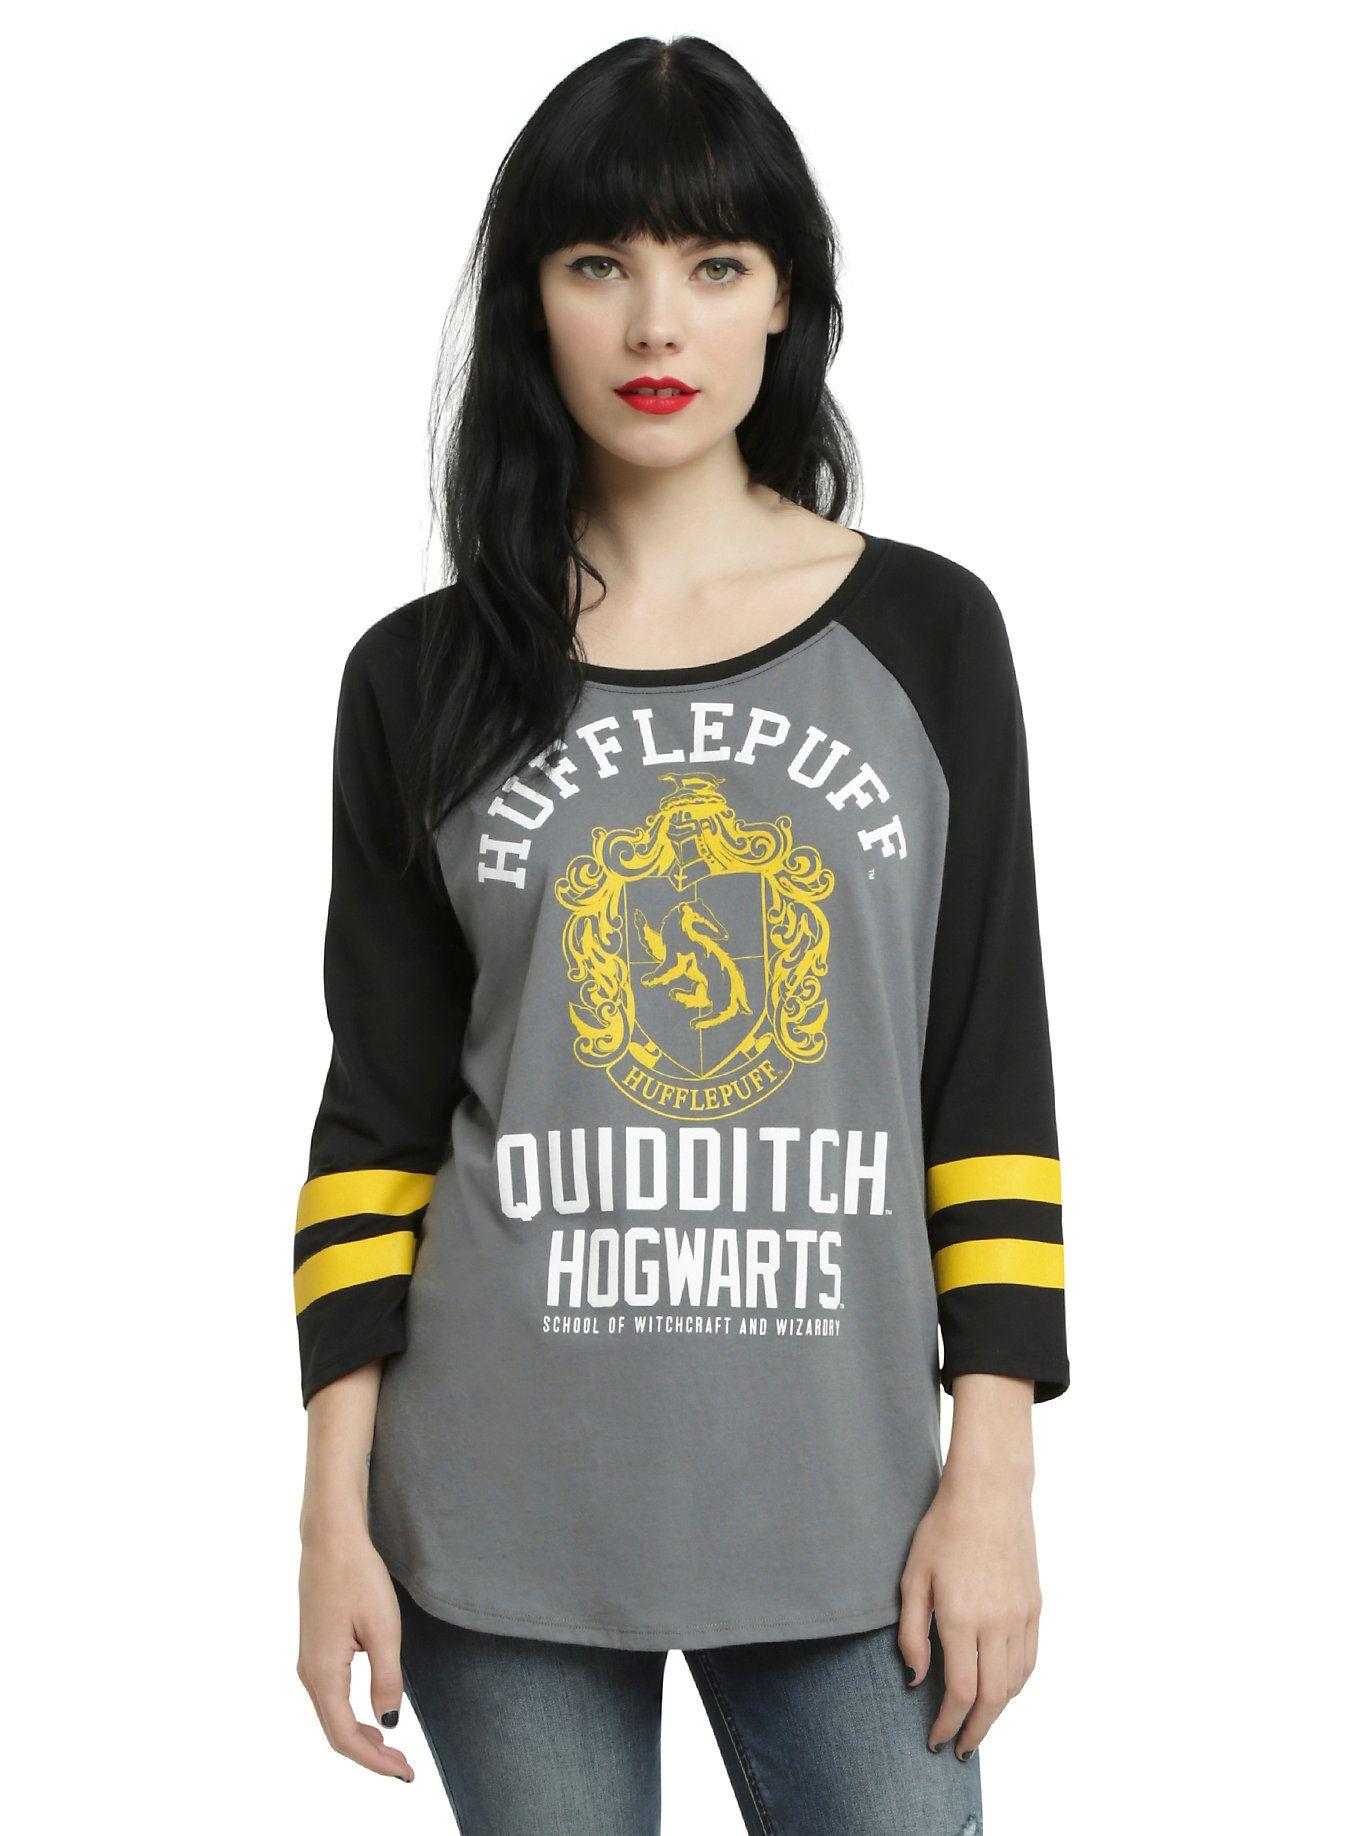 Harry Potter Hufflepuff Quidditch Girls Raglan